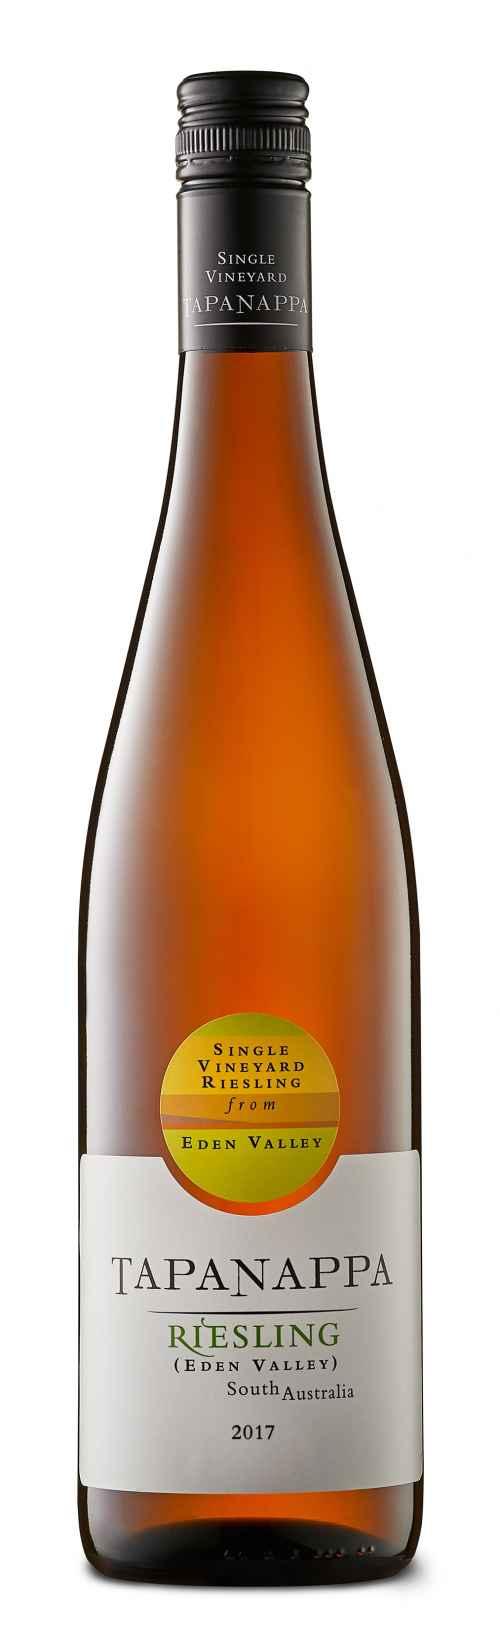 Tapanappa Eden Valley 2017 Riesling bottleshot